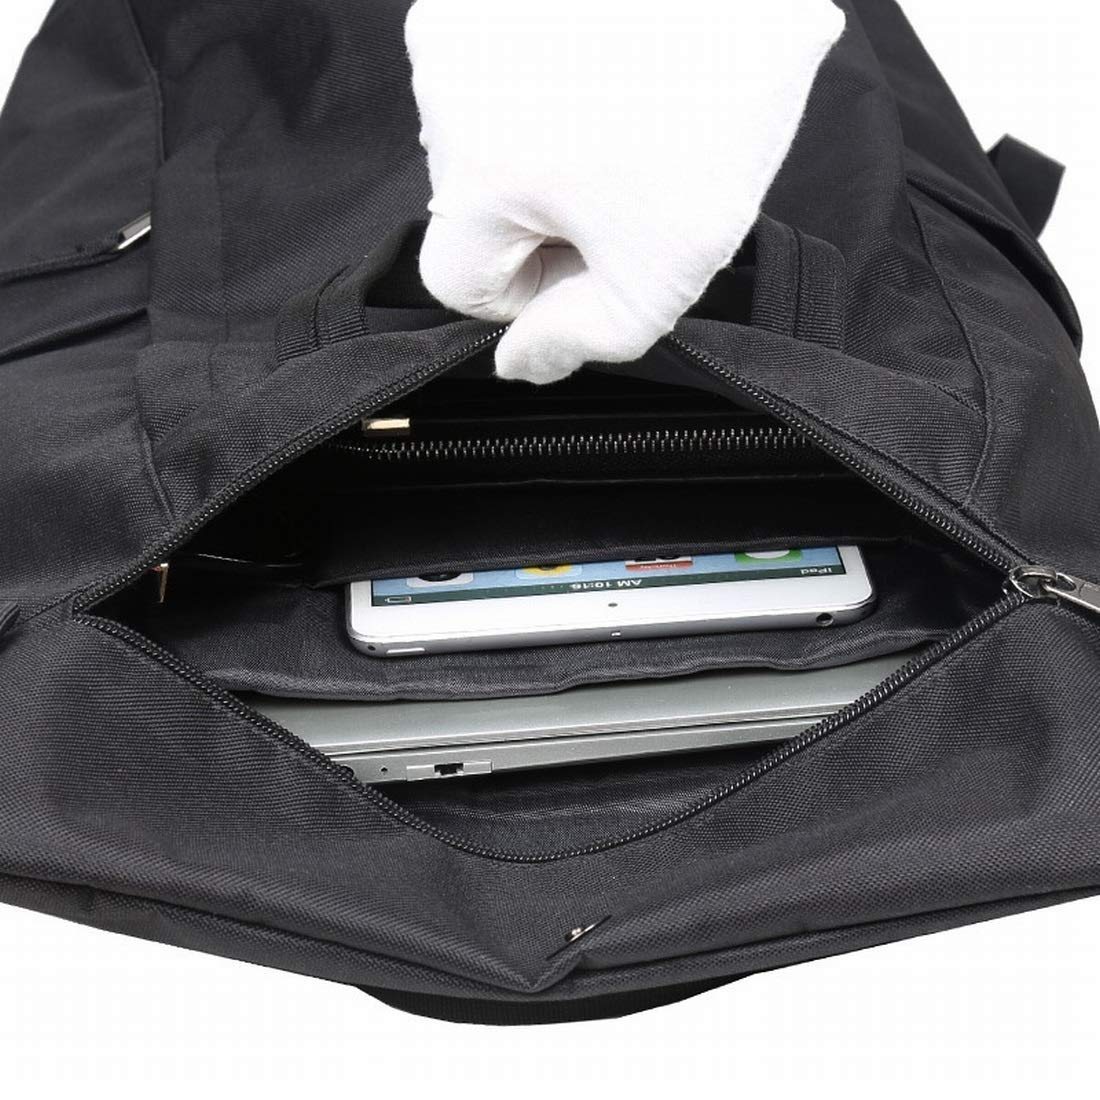 Fitness Souliyan Backpack Travel Business Backpack Backpack Sports Bag Fitness Bag for Men and Women Yoga